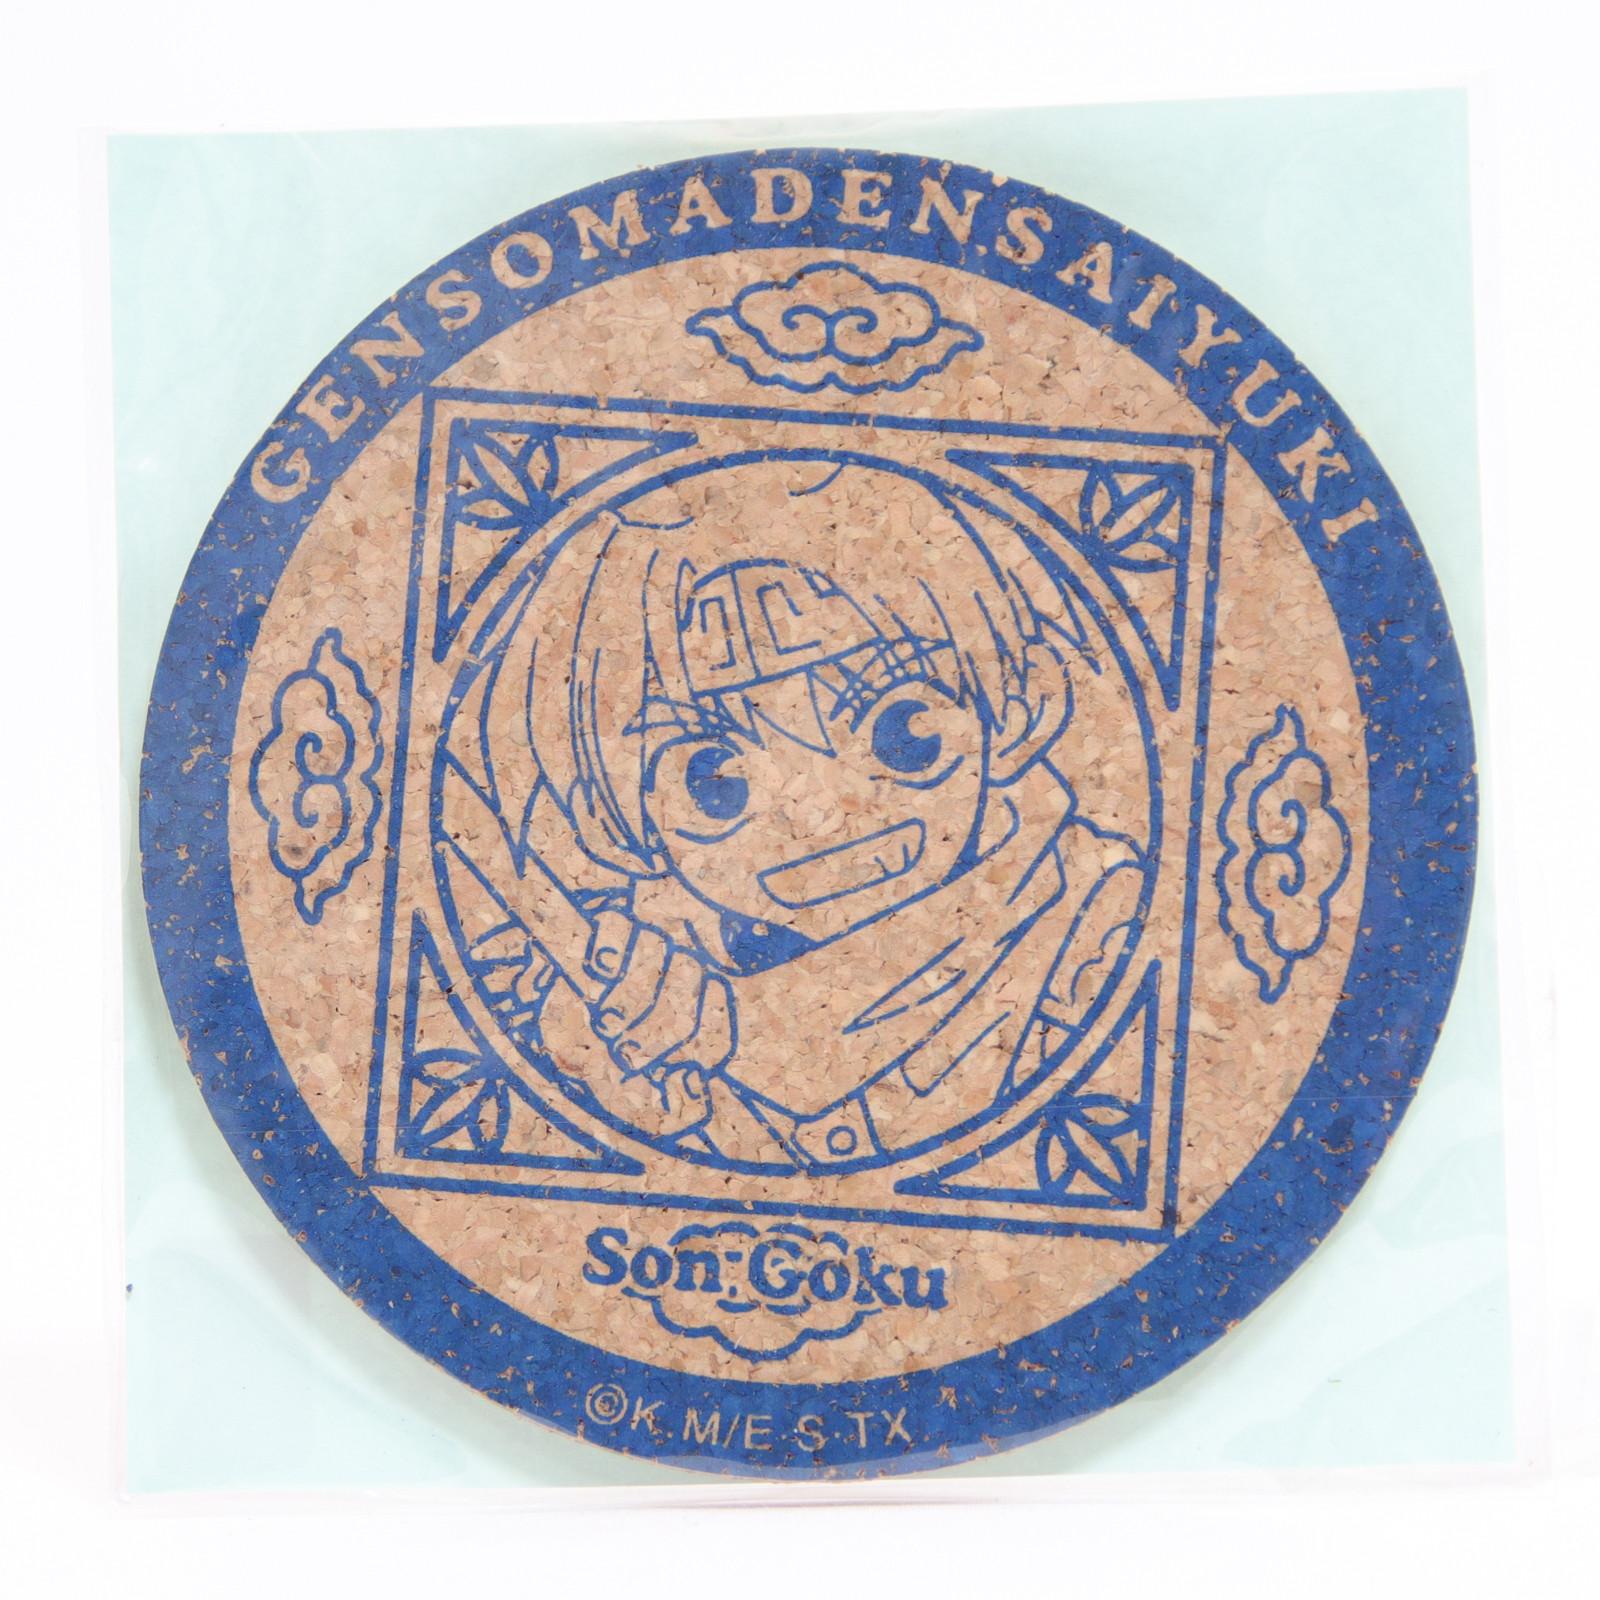 Gensomaden SAIYUKI Son Goku Cork Coaster JAPAN ANIME MANGA